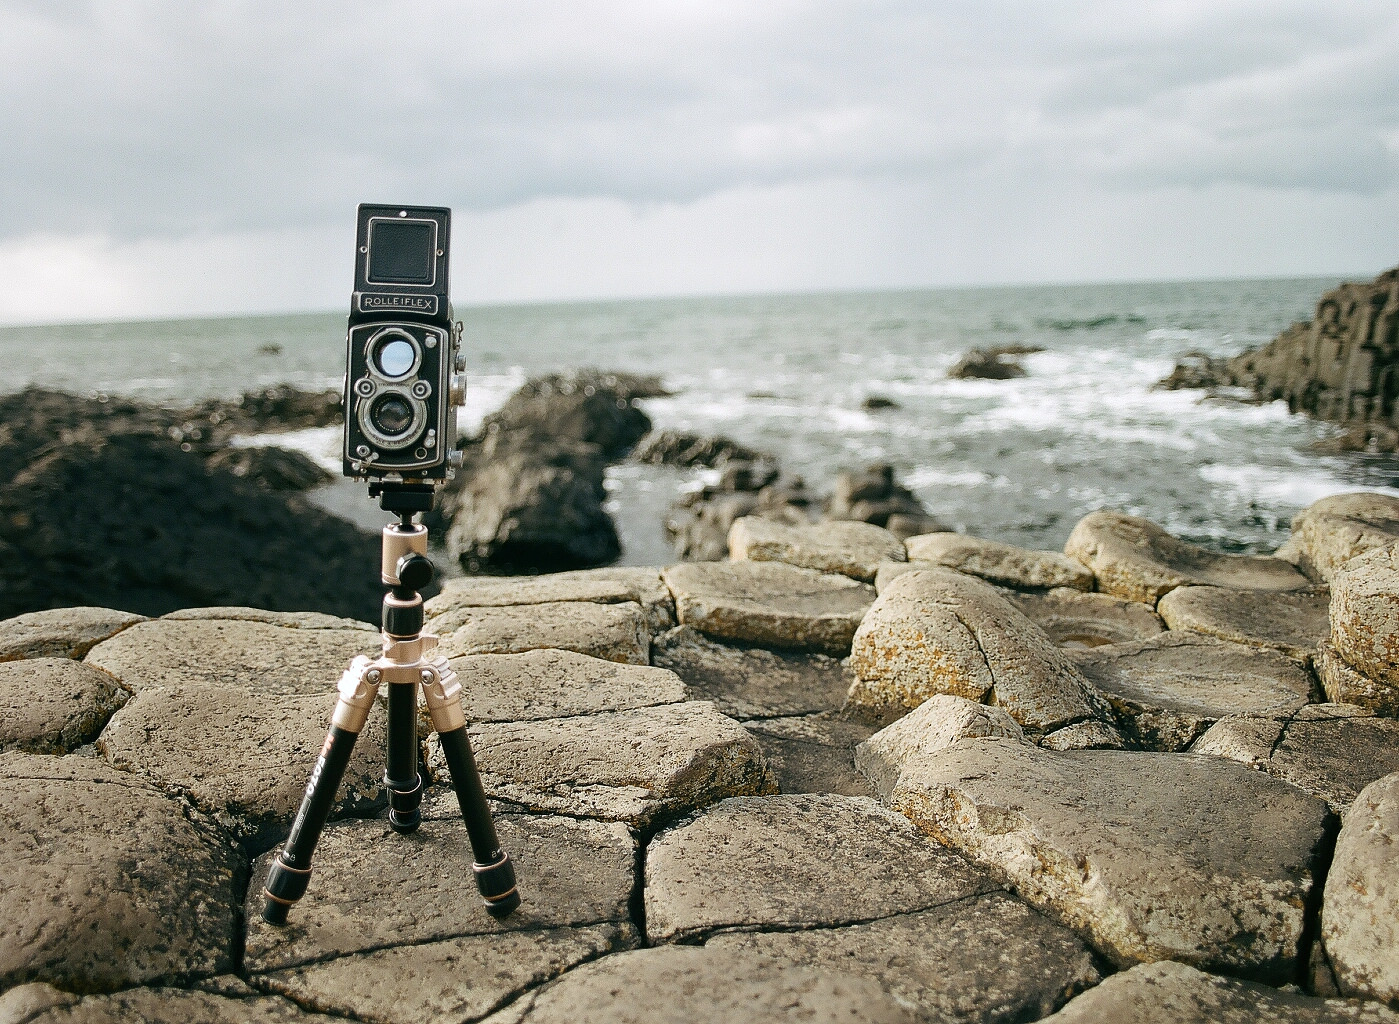 brian-petrillo-mamiya-m645-medium-format-film-camera-film-objektiv-100-words-1.jpeg